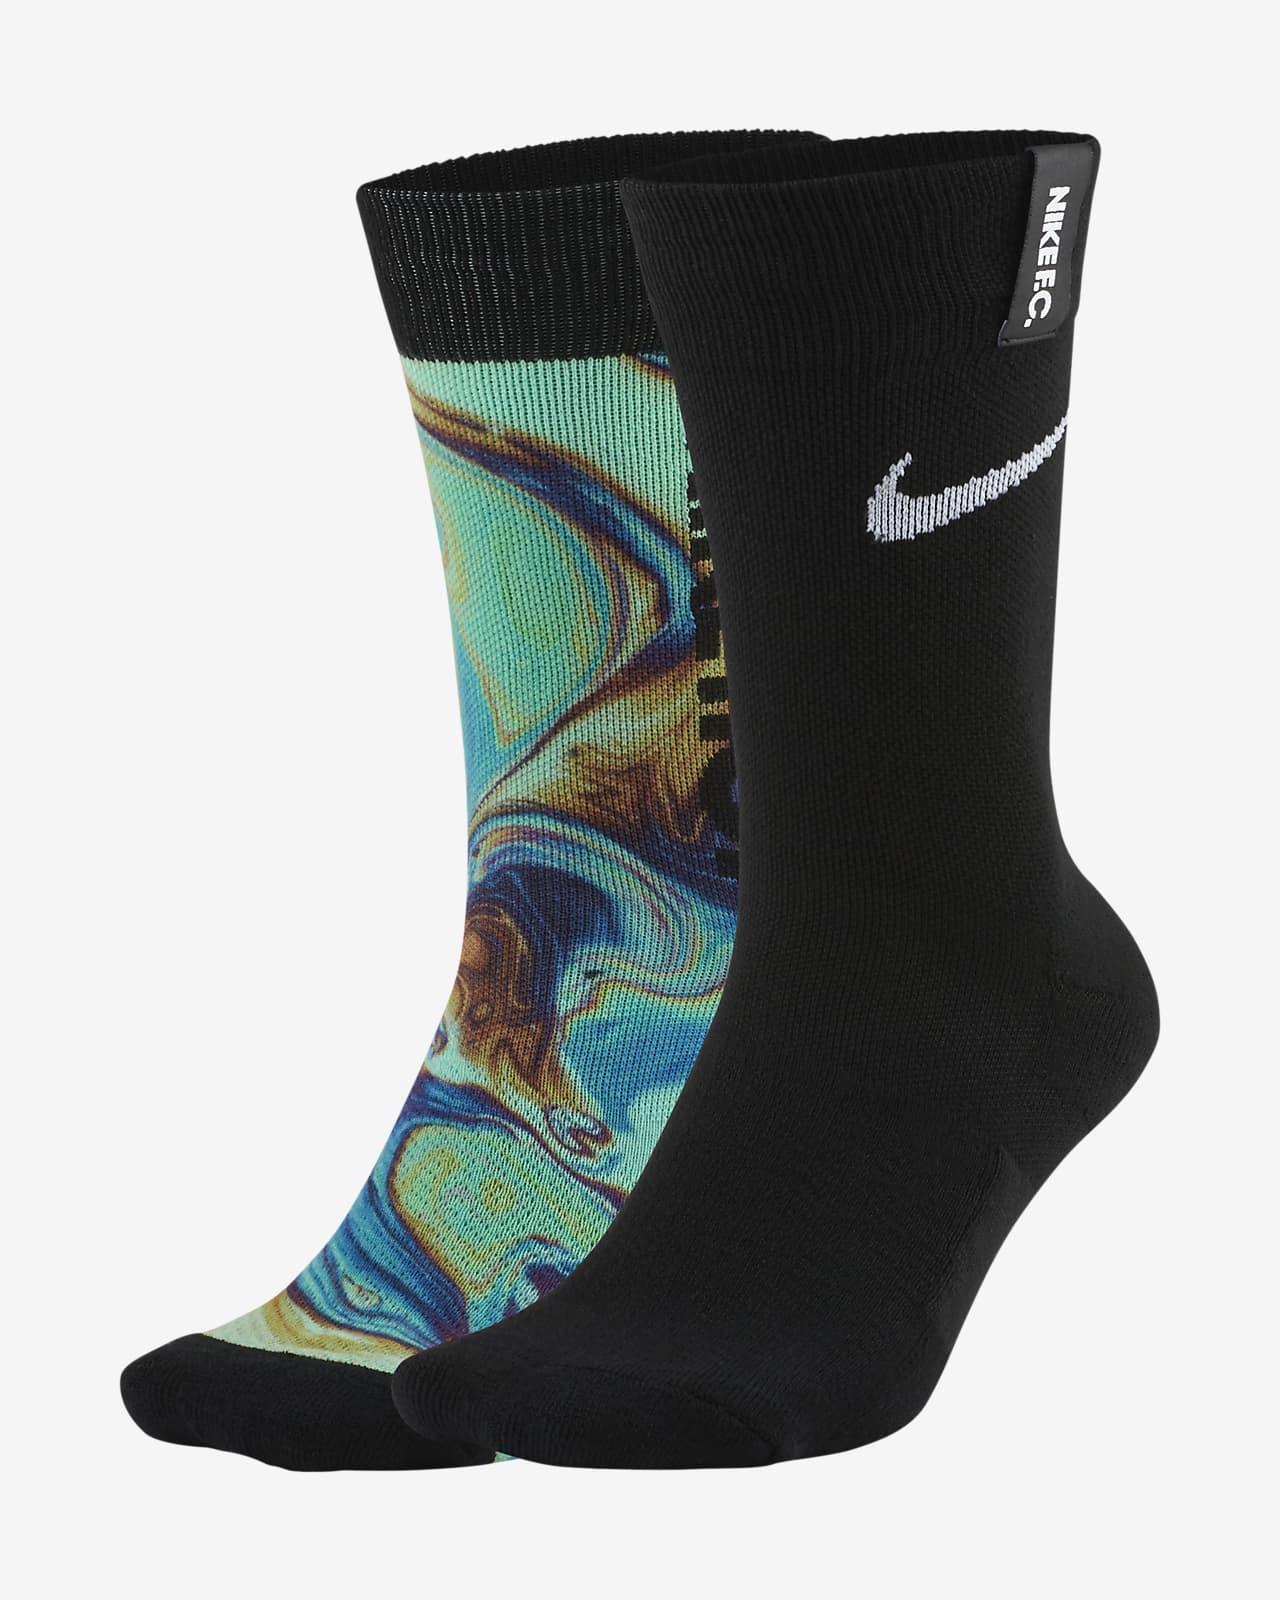 Nike F.C. SNKR Sox Essential Crew Soccer Socks